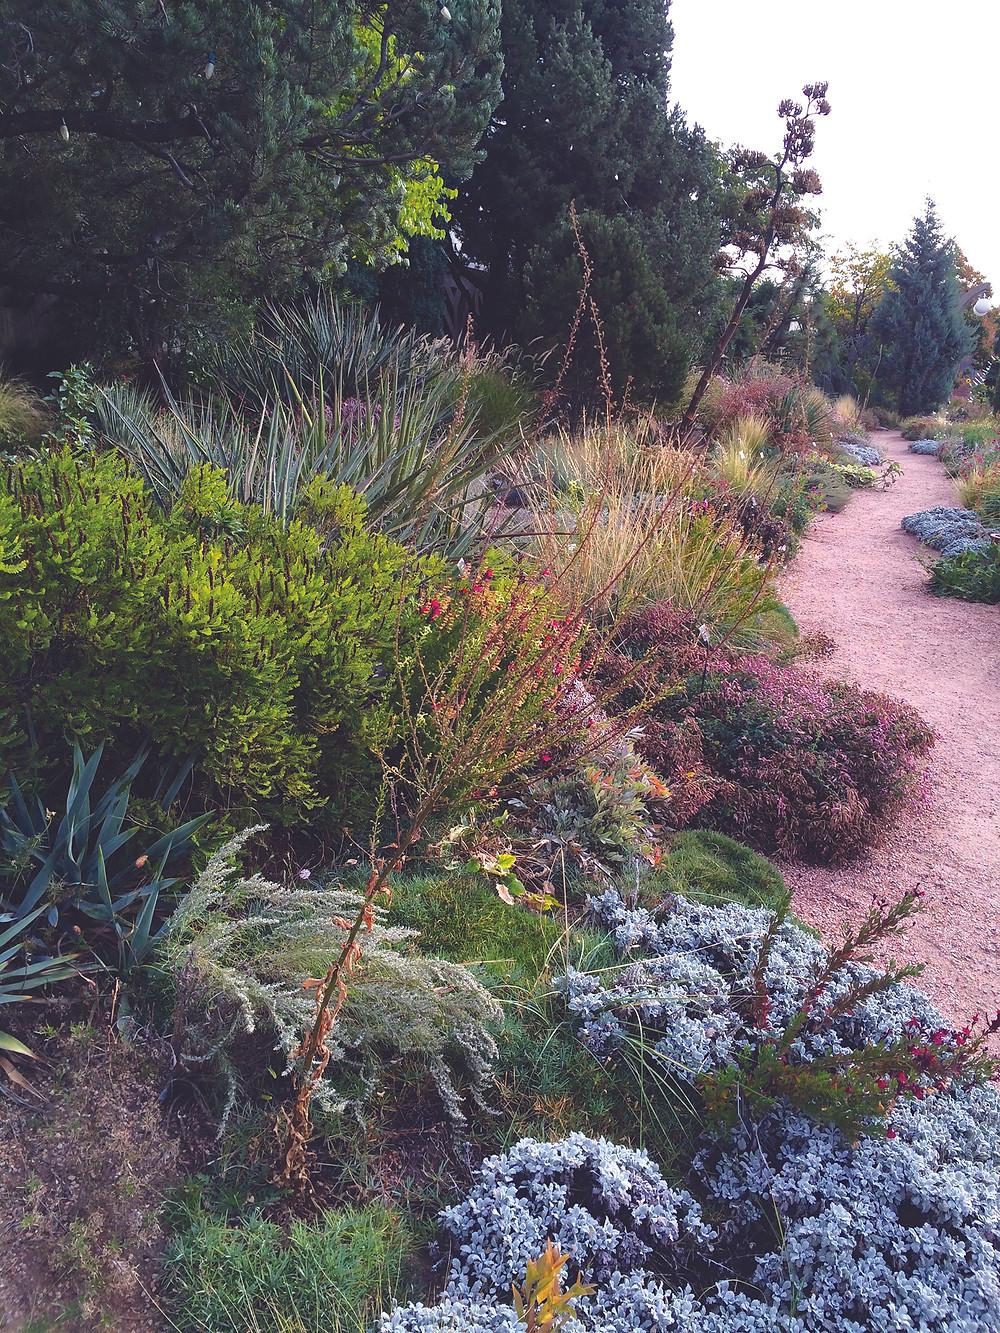 Late autumn in the Roads Watersmart Garden at DBG designed by Lauren Springer. Photo: Lauren Springer